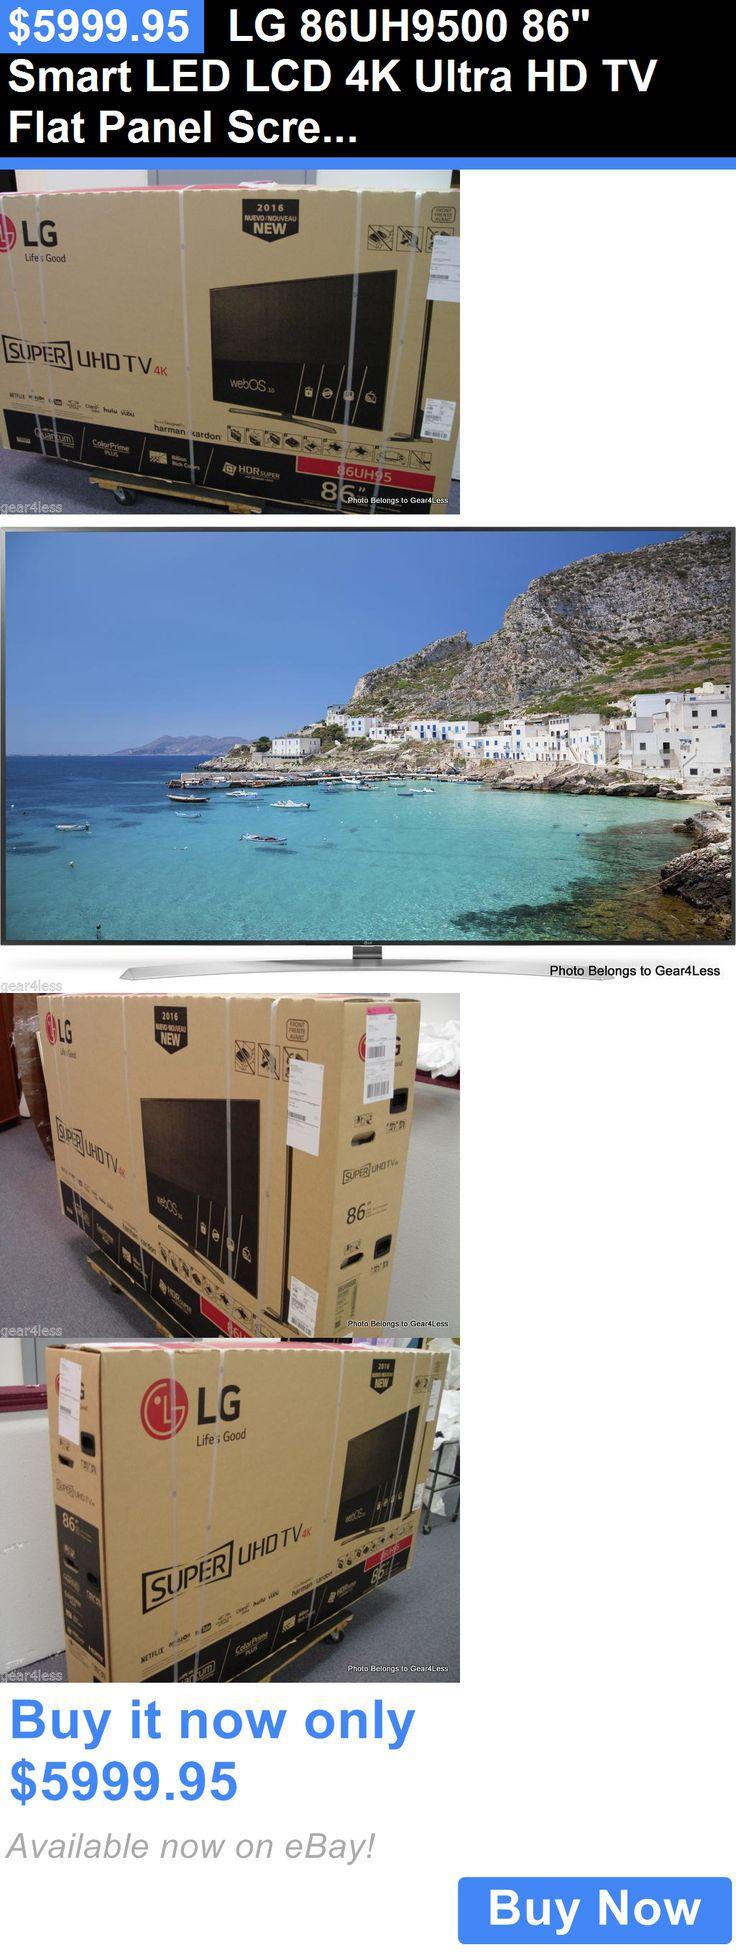 Smart TV Lg 86Uh9500 86 Smart Led Lcd 4K Ultra Hd Tv Flat